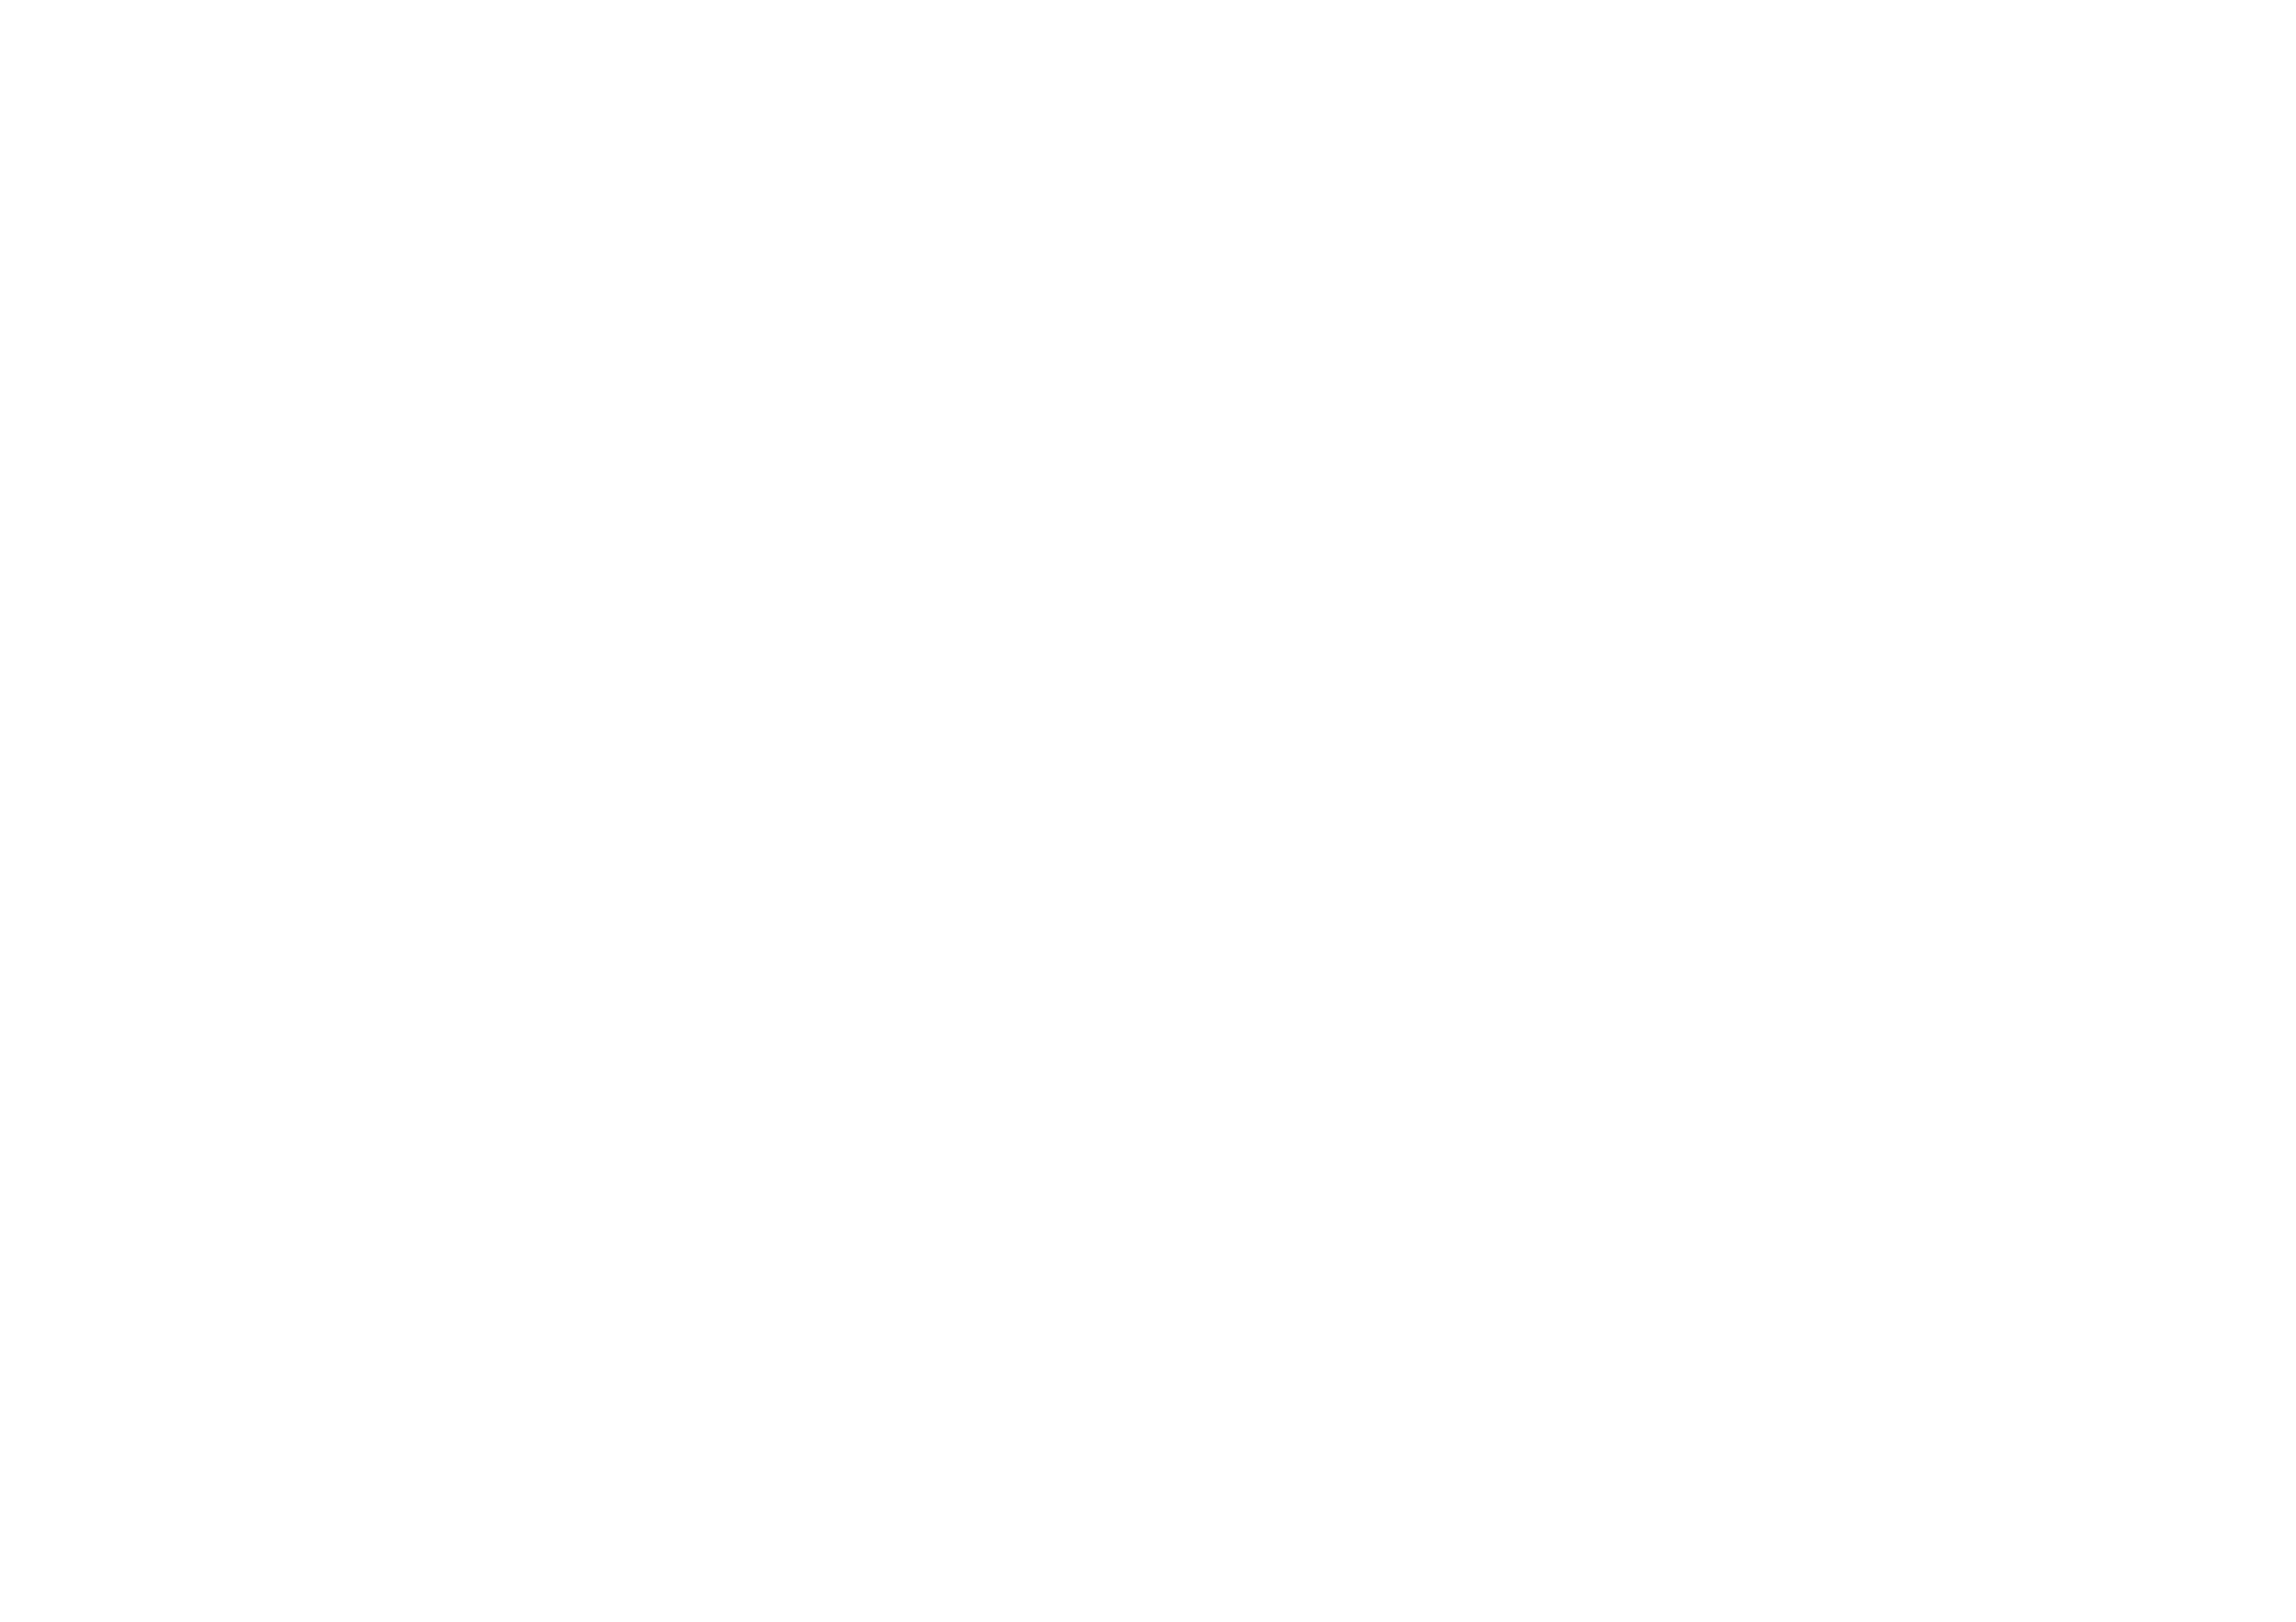 TampaBayVirtualLogoREV.png